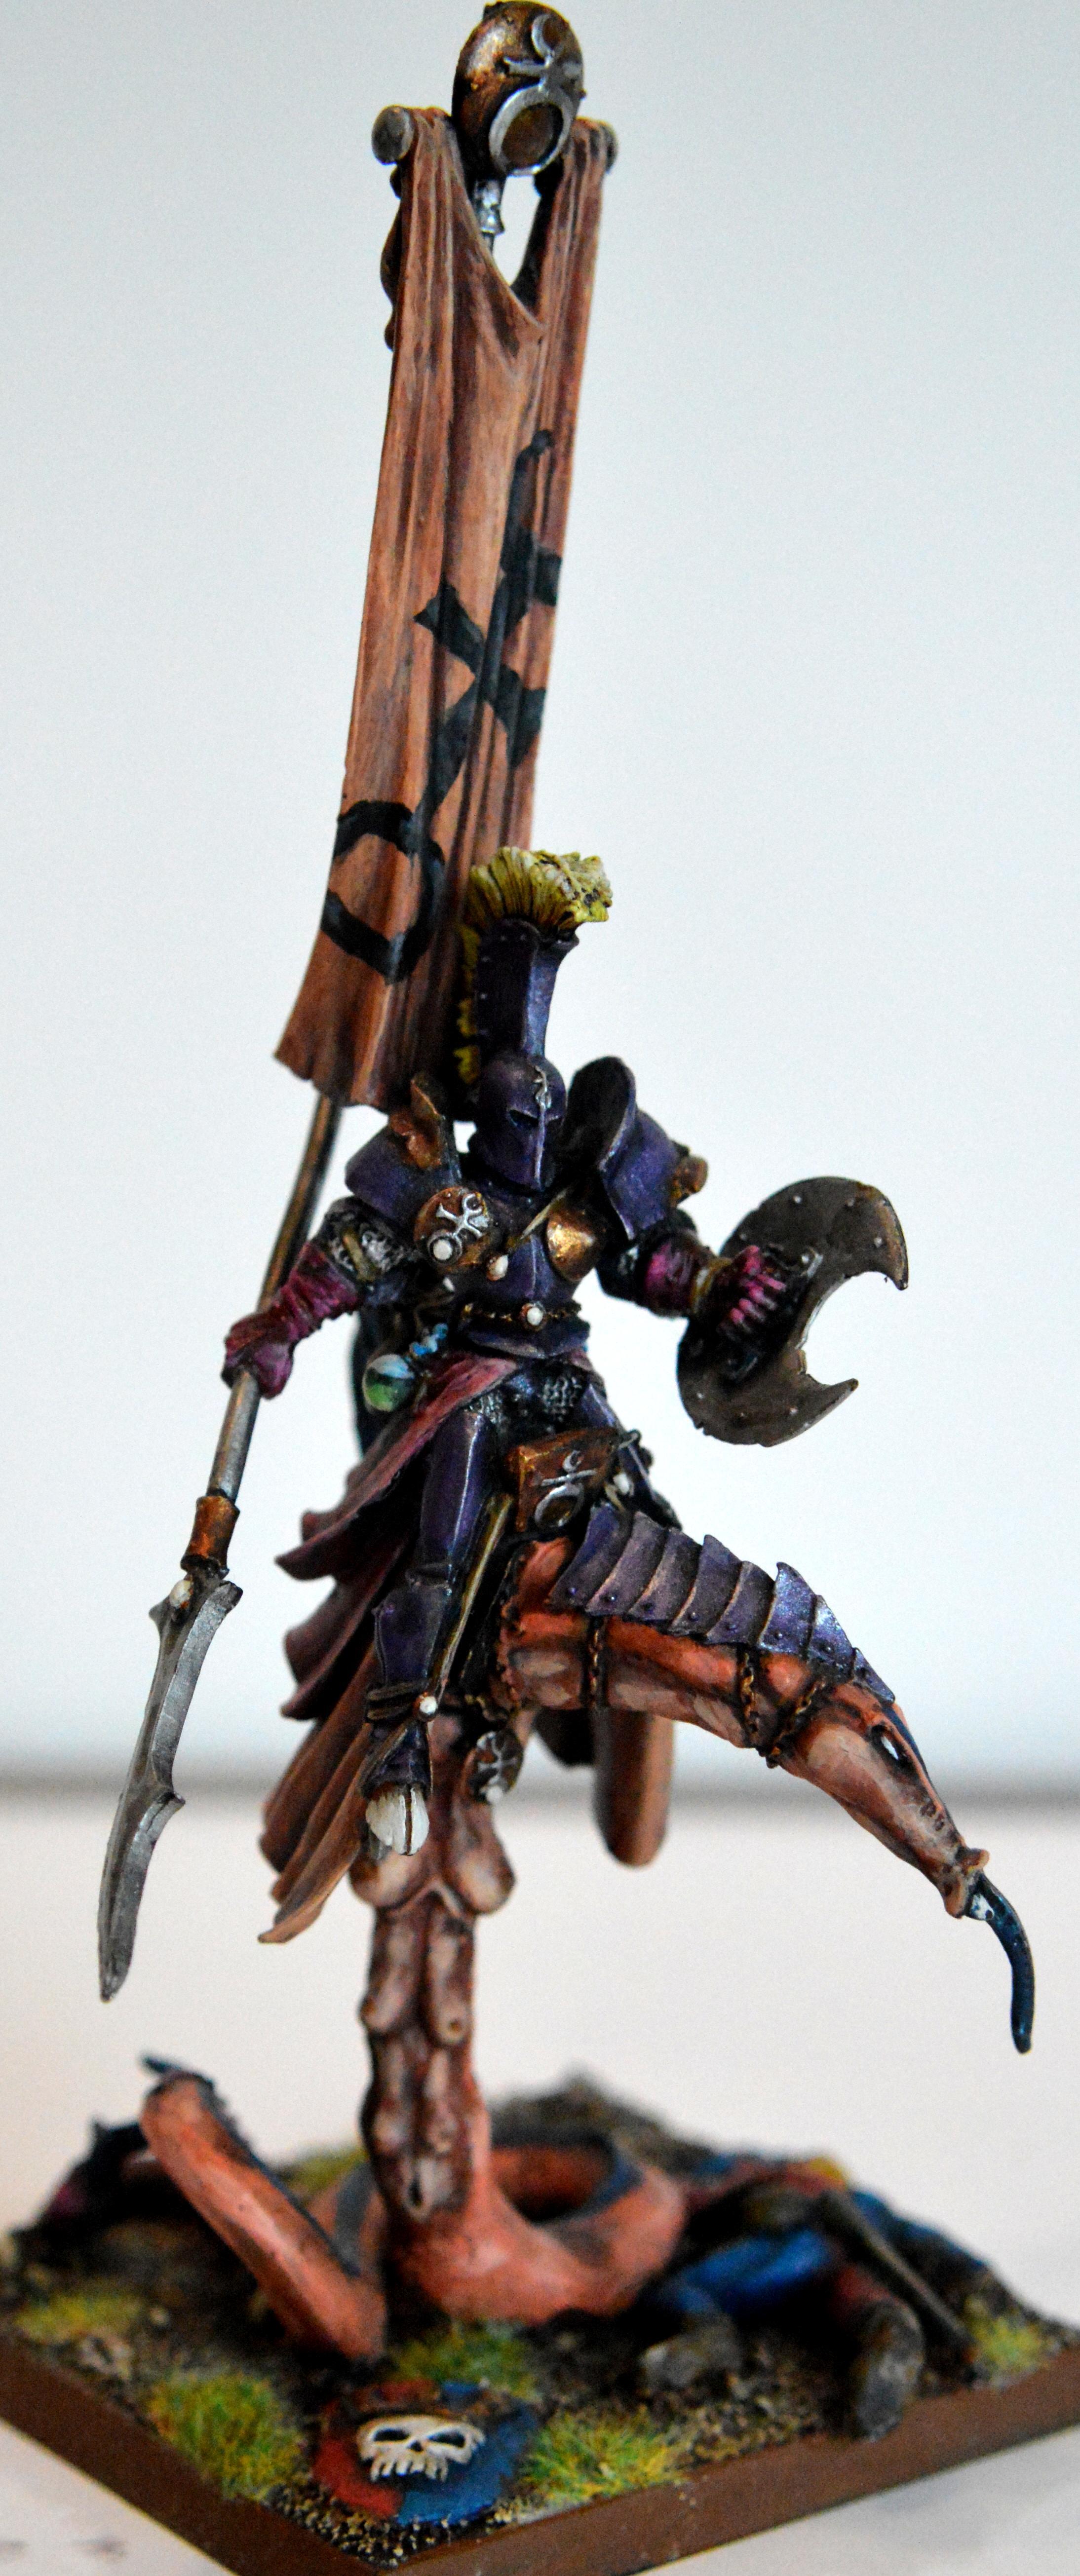 Chaos, Juggernaut, Khorne, Nurgle, Slaanesh, Warhammer Fantasy, Warriors Of Chaos